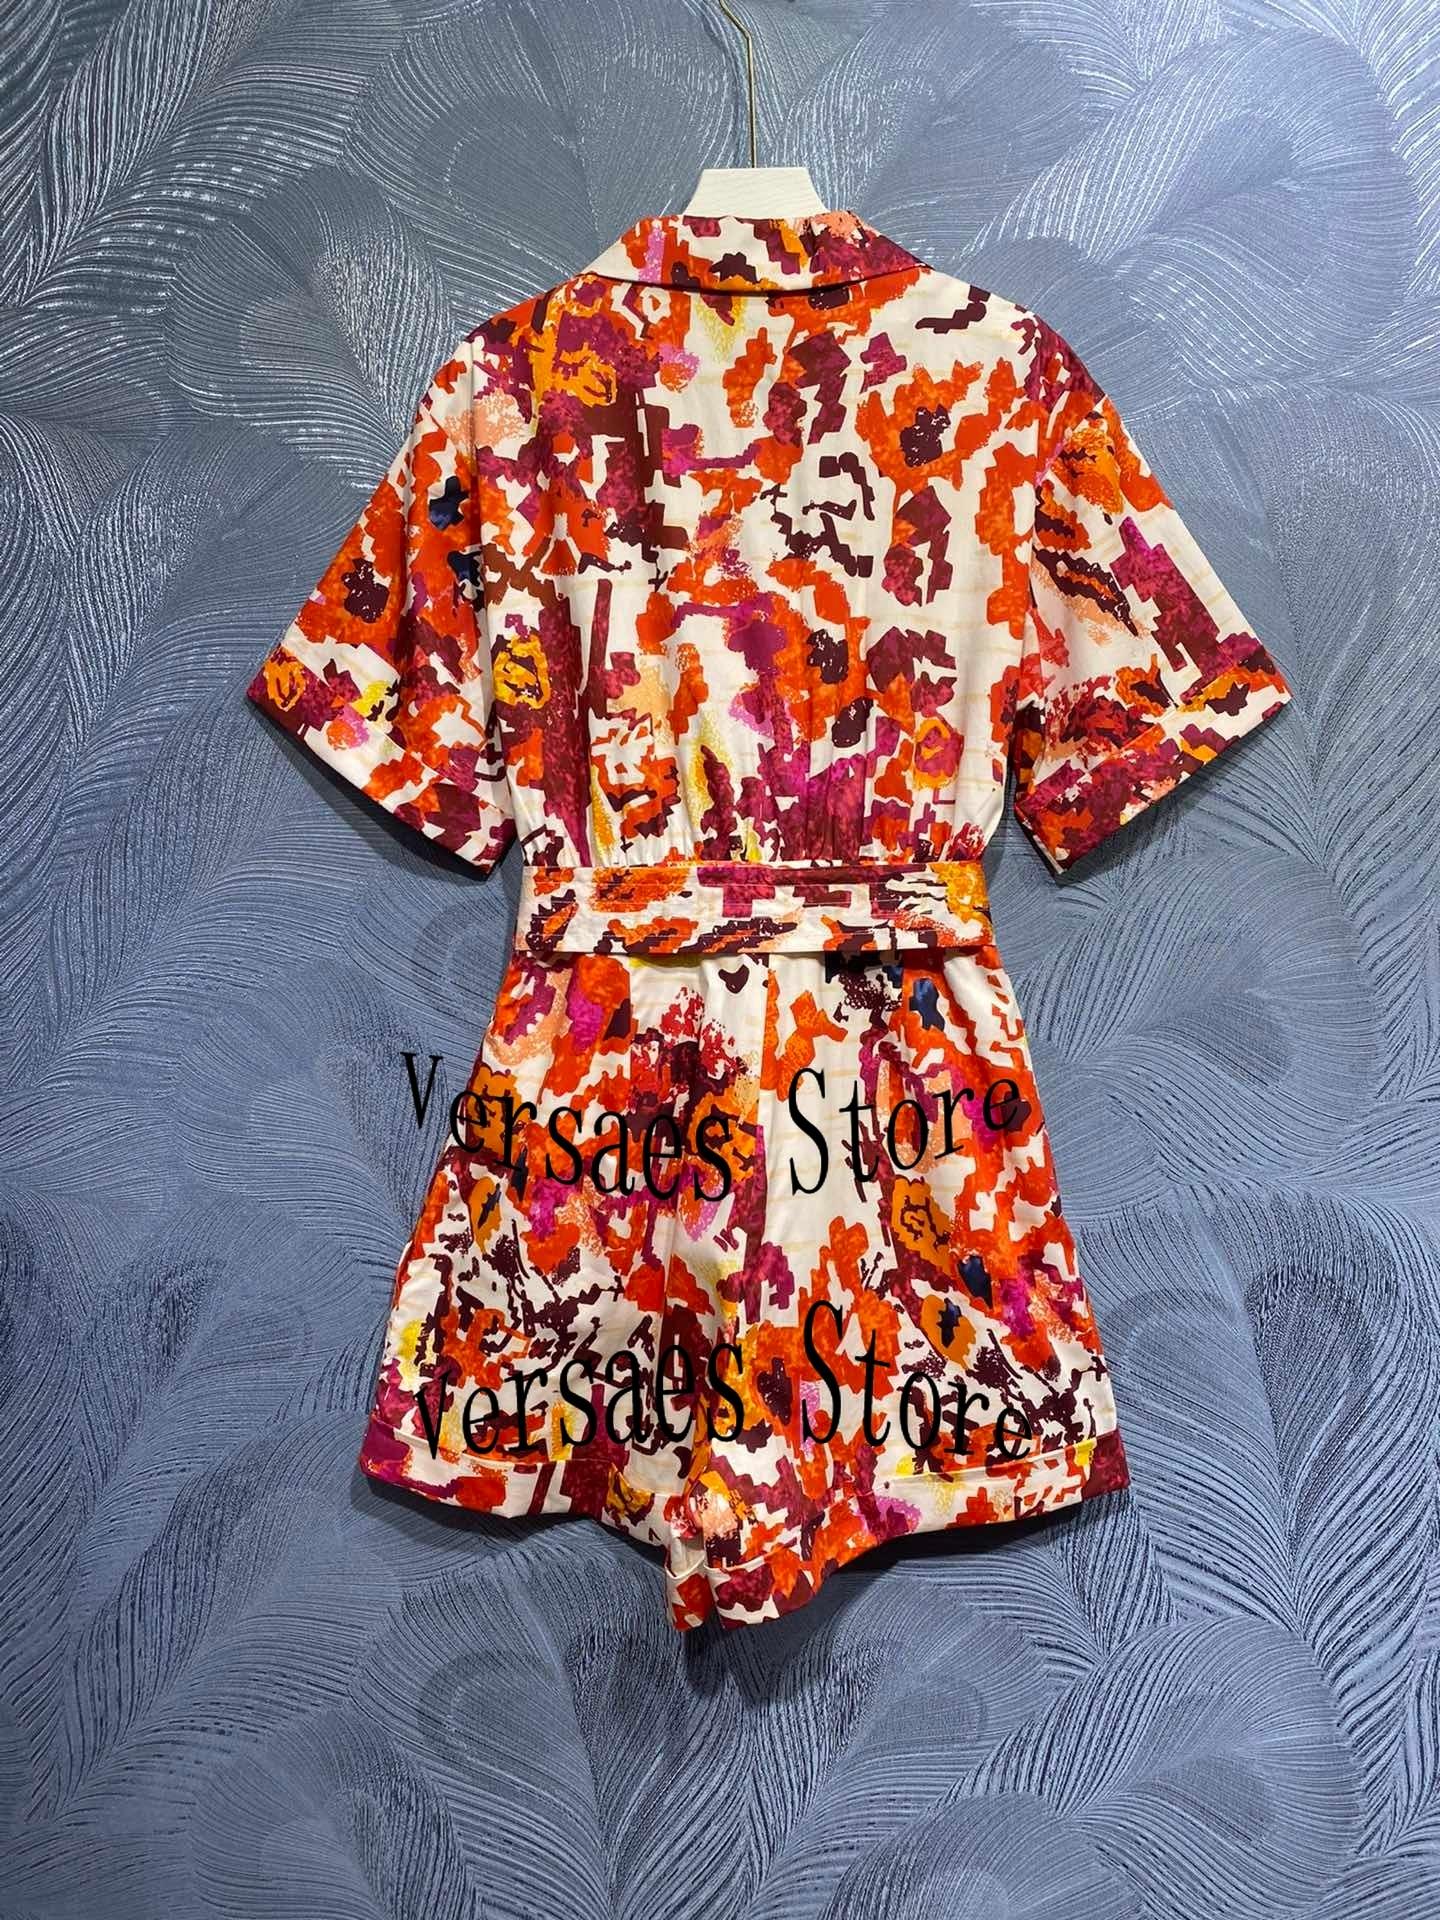 luxury brand graffiti printing fashion women's temperament changing age reducing cotton short sleeve printing one-piece shorts enlarge